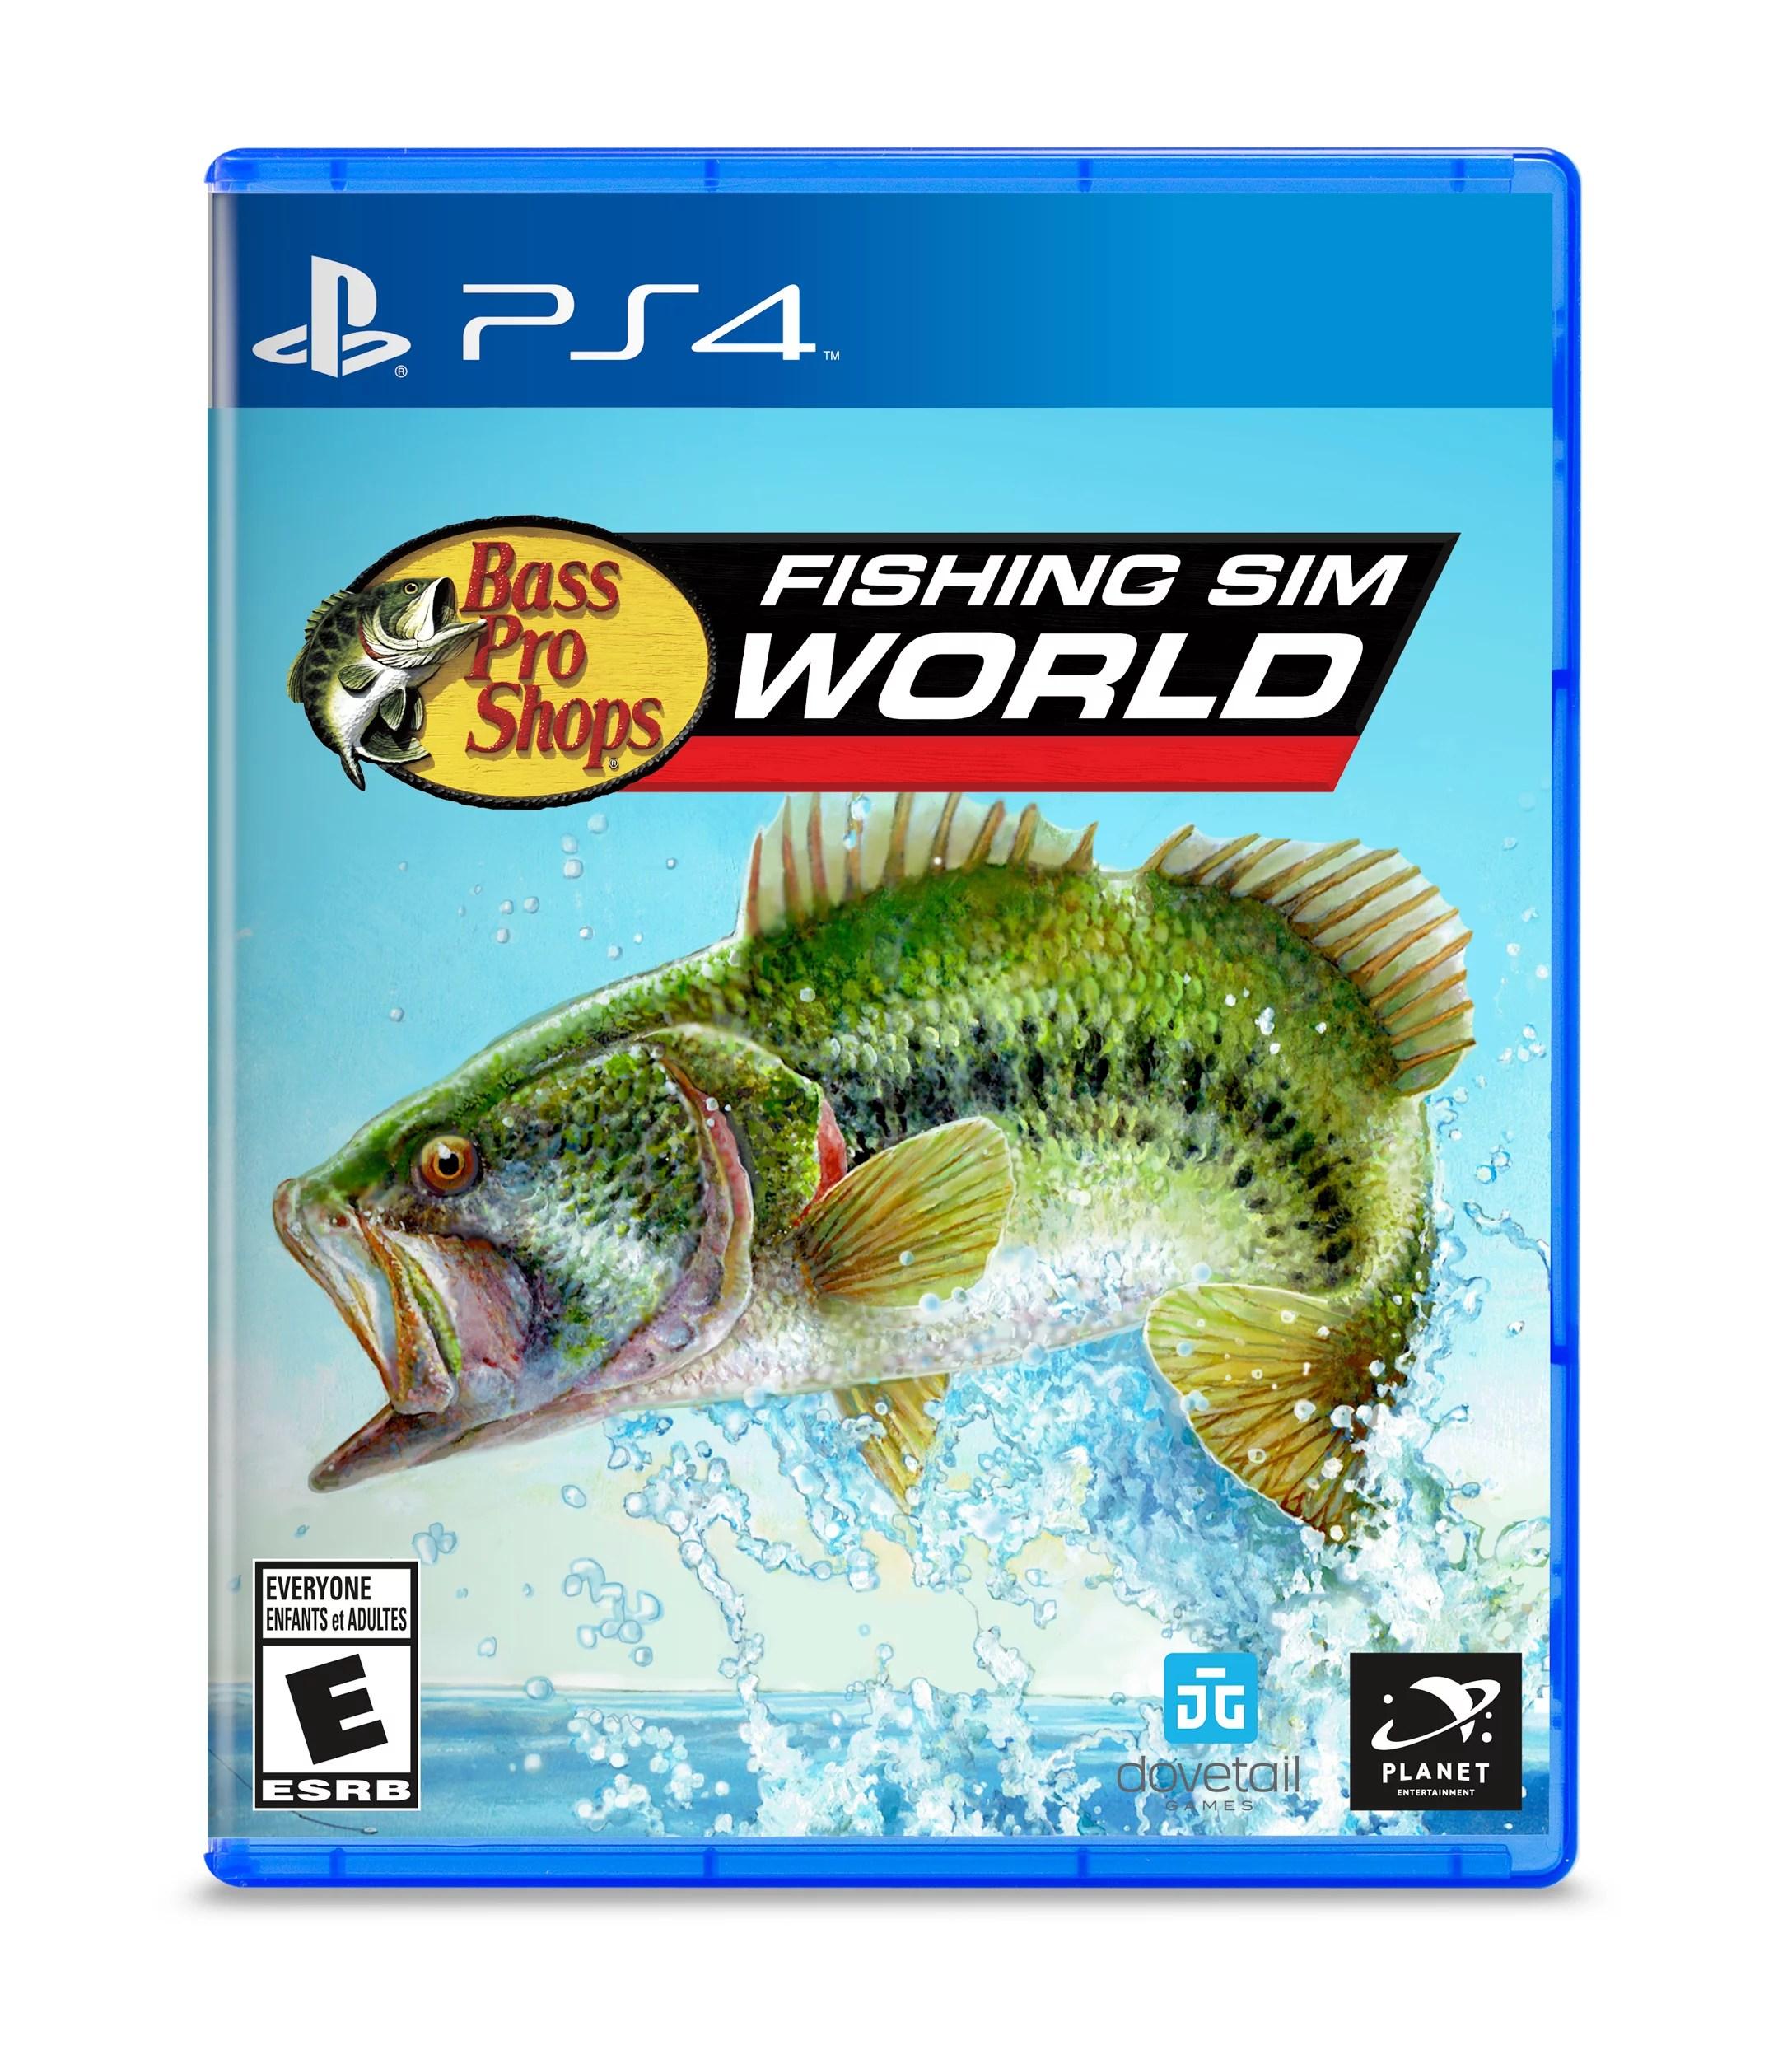 bass pro shops fishing sim world playstation 4 860108001213 walmart com